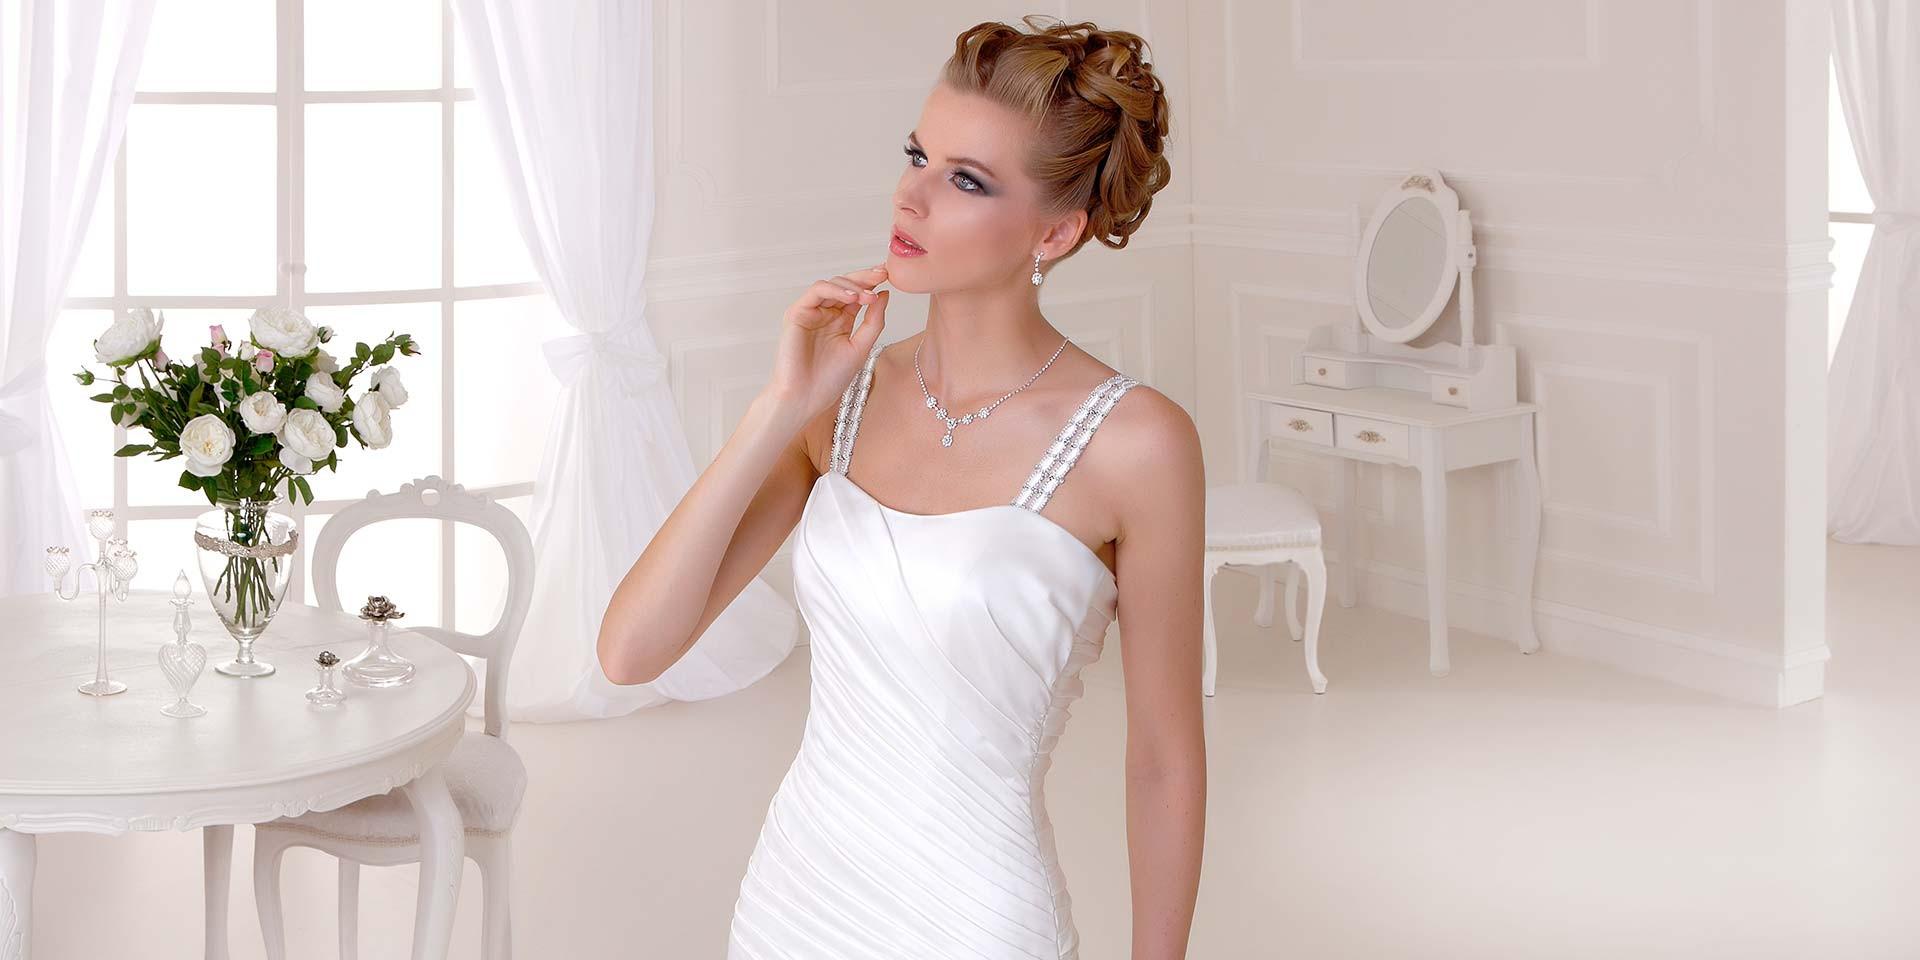 Helen bridal abiti da sposa